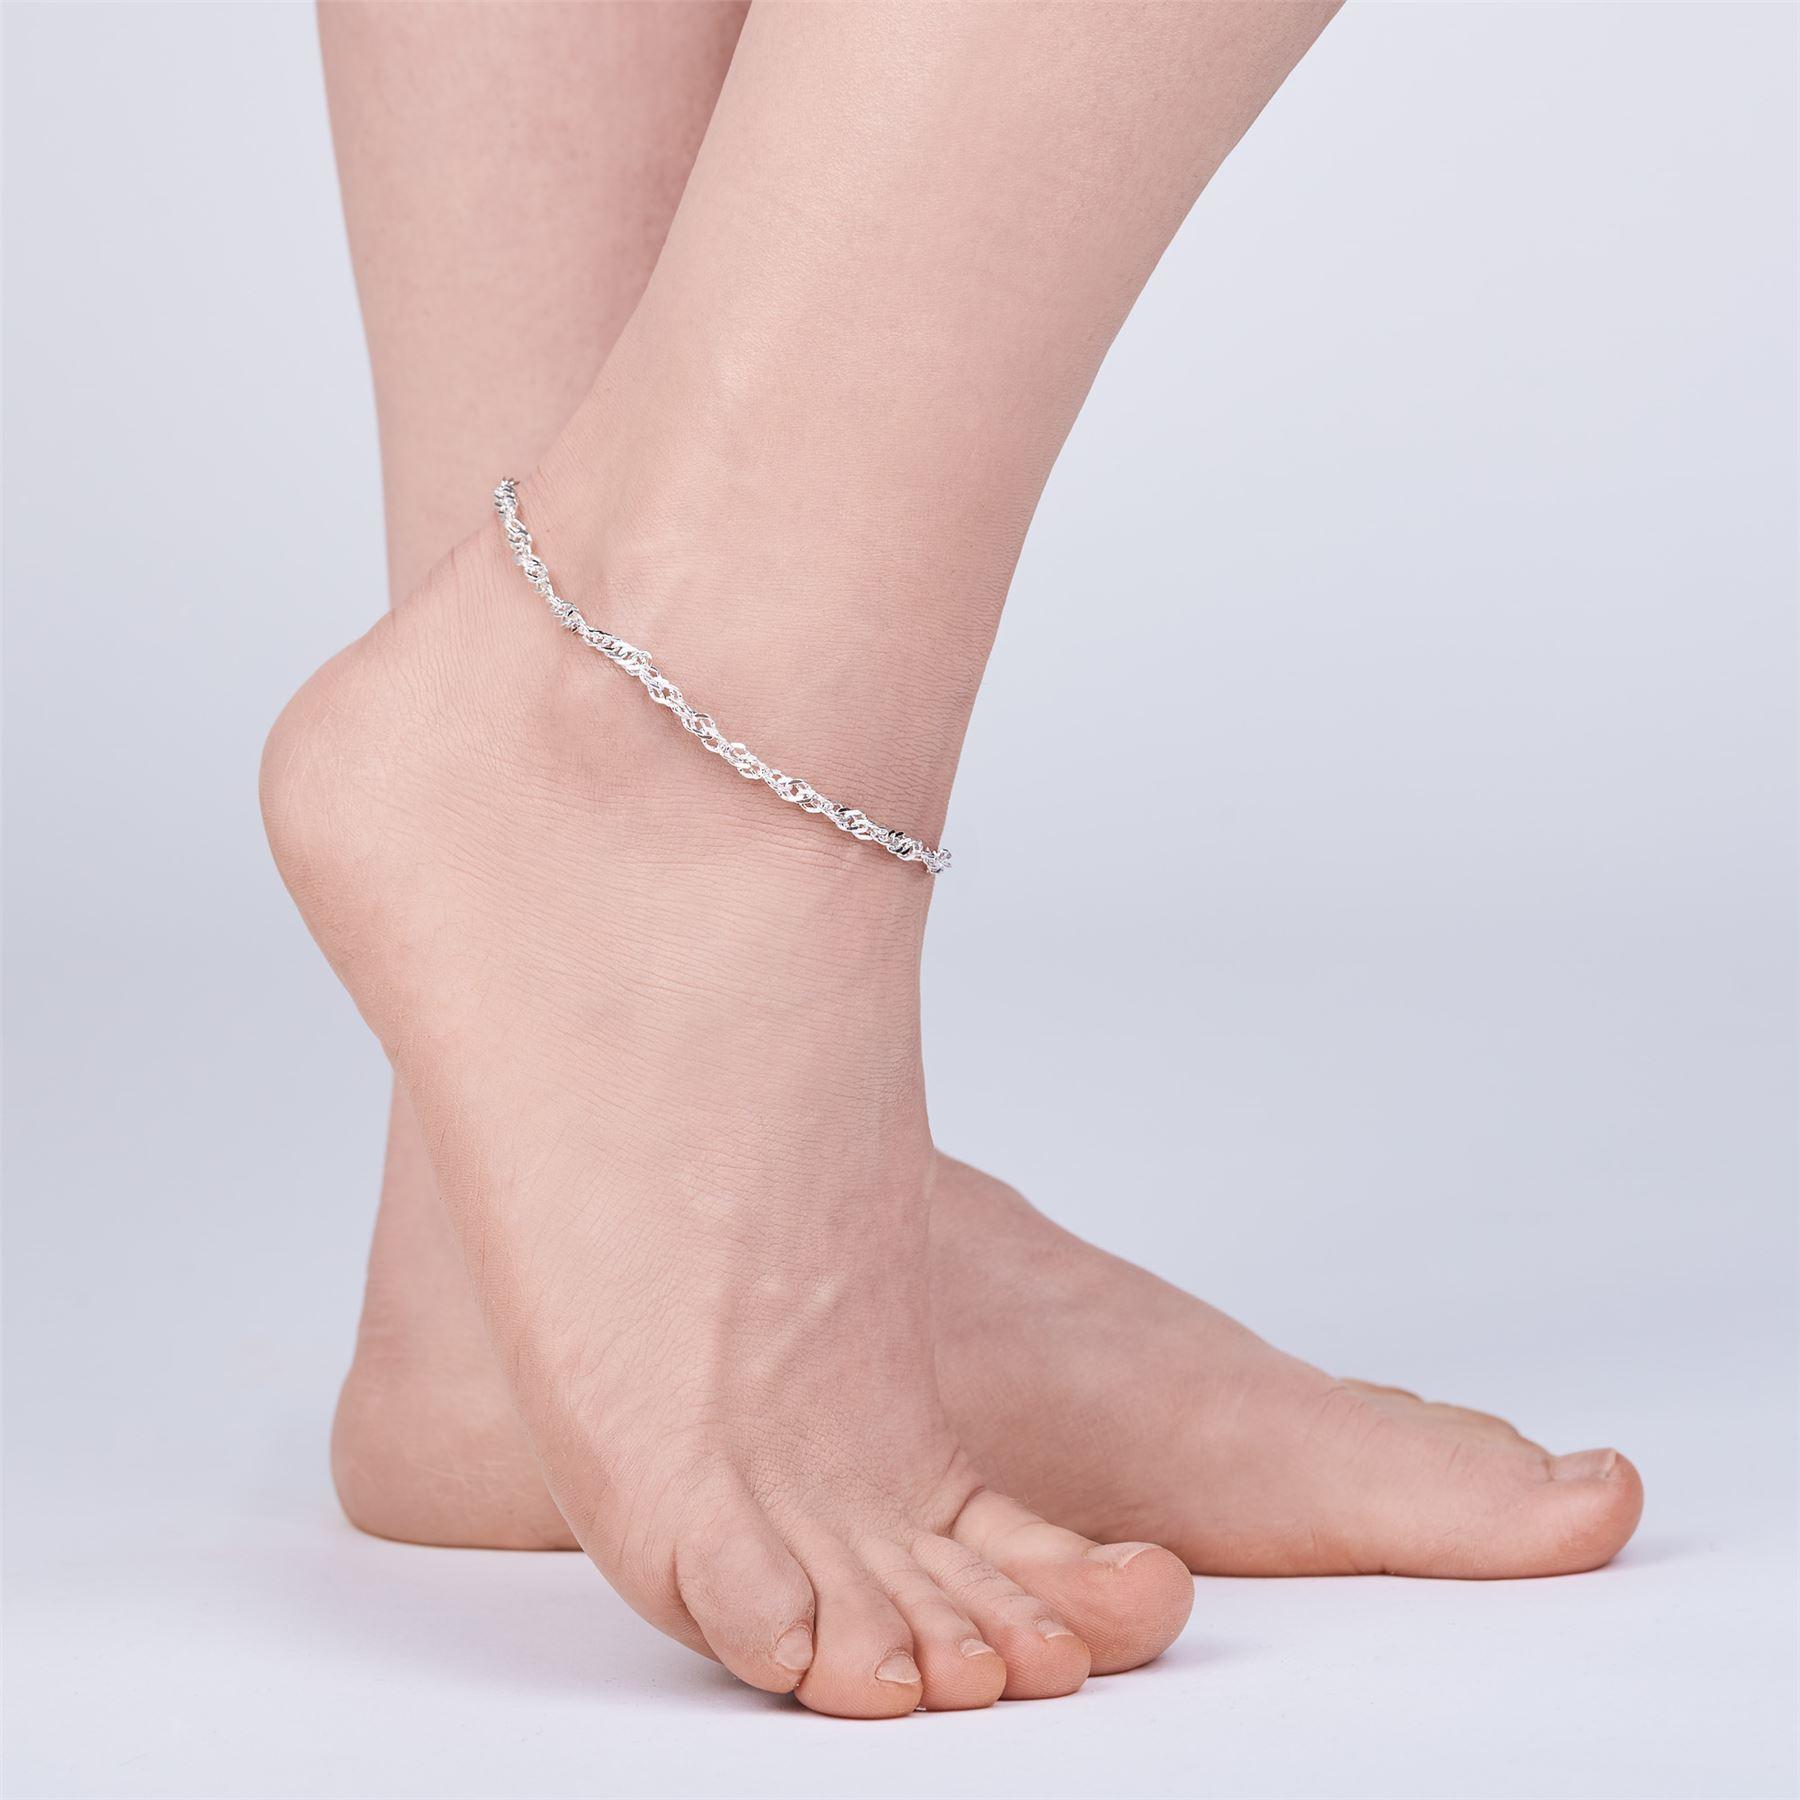 Amberta-Jewelry-925-Sterling-Silver-Adjustable-Anklet-Foot-Bracelet-for-Women miniature 49